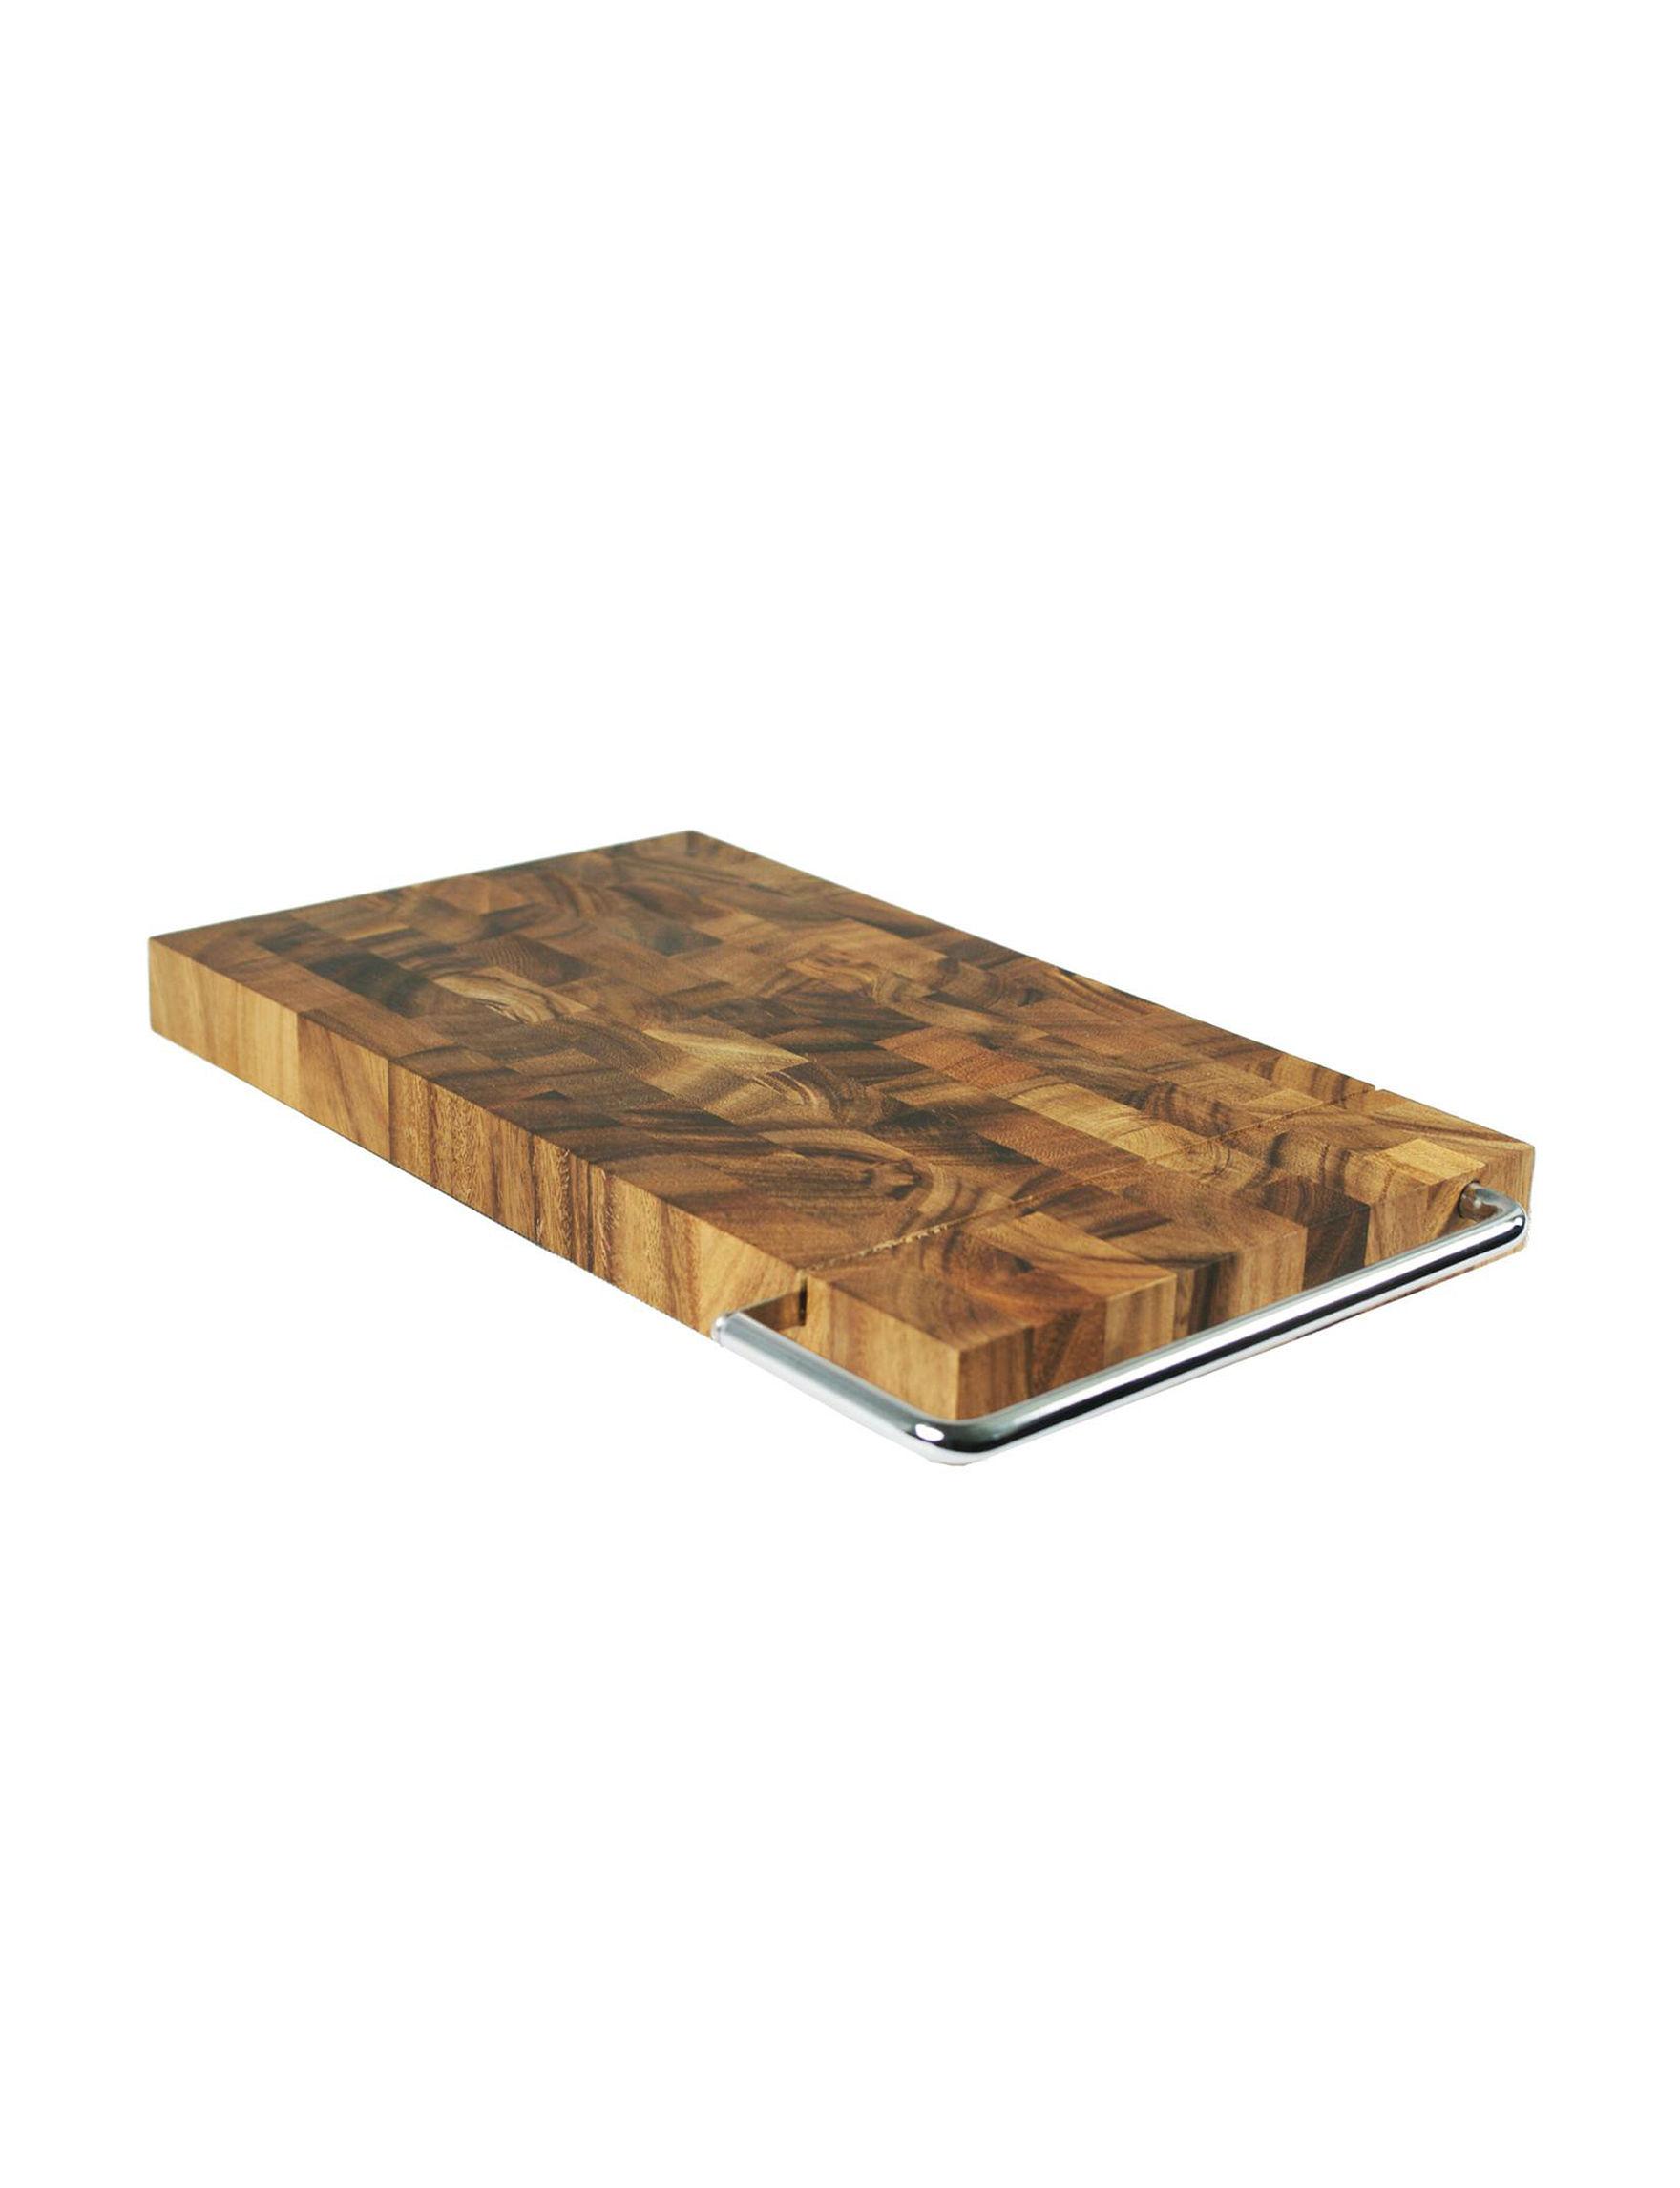 Ironwood Gourmet Wood Cutting Boards Prep & Tools